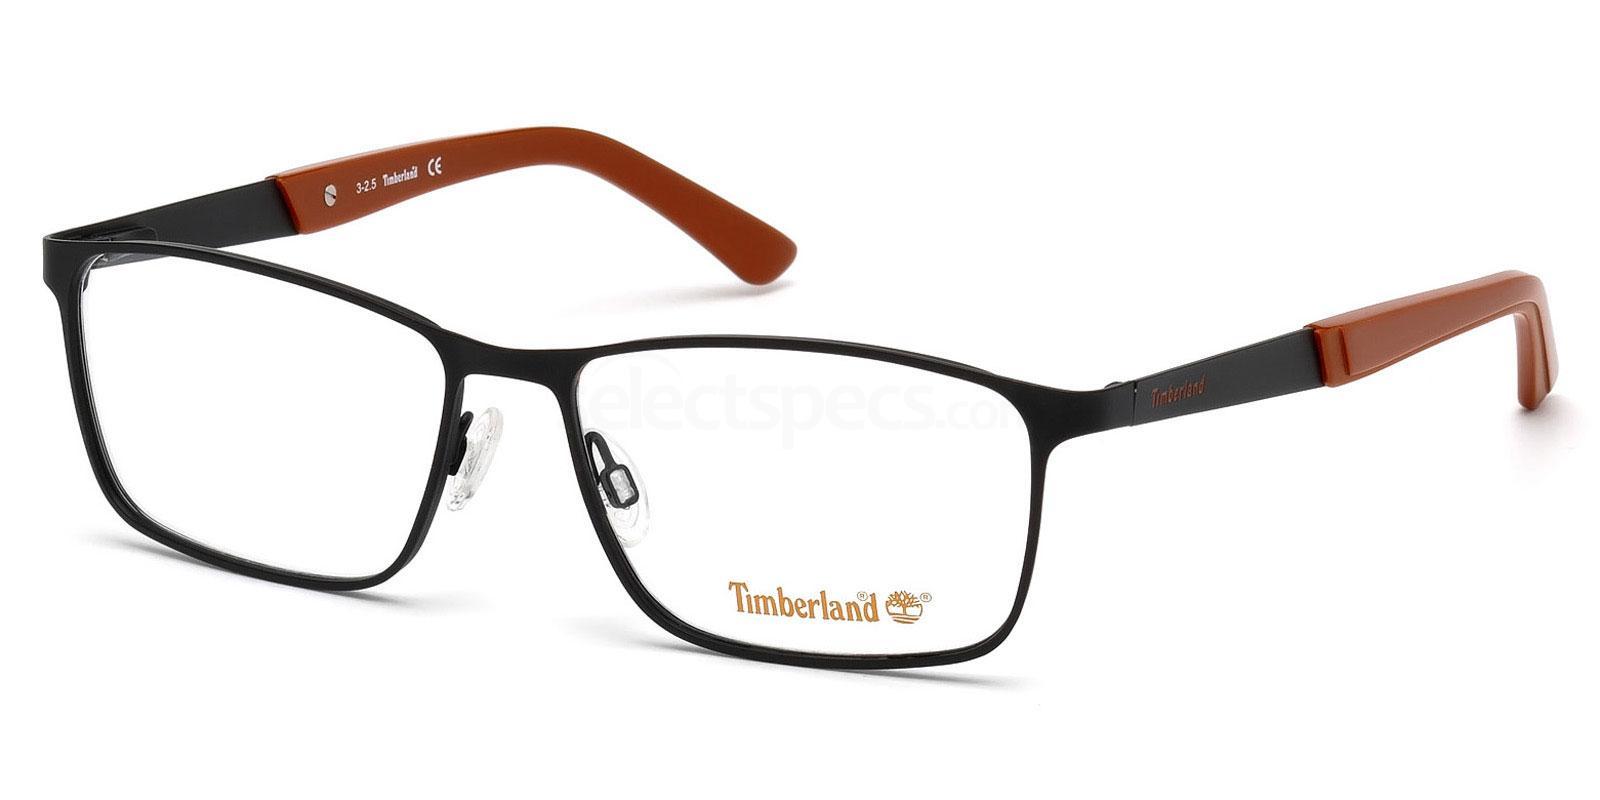 002 TB1359 Glasses, Timberland